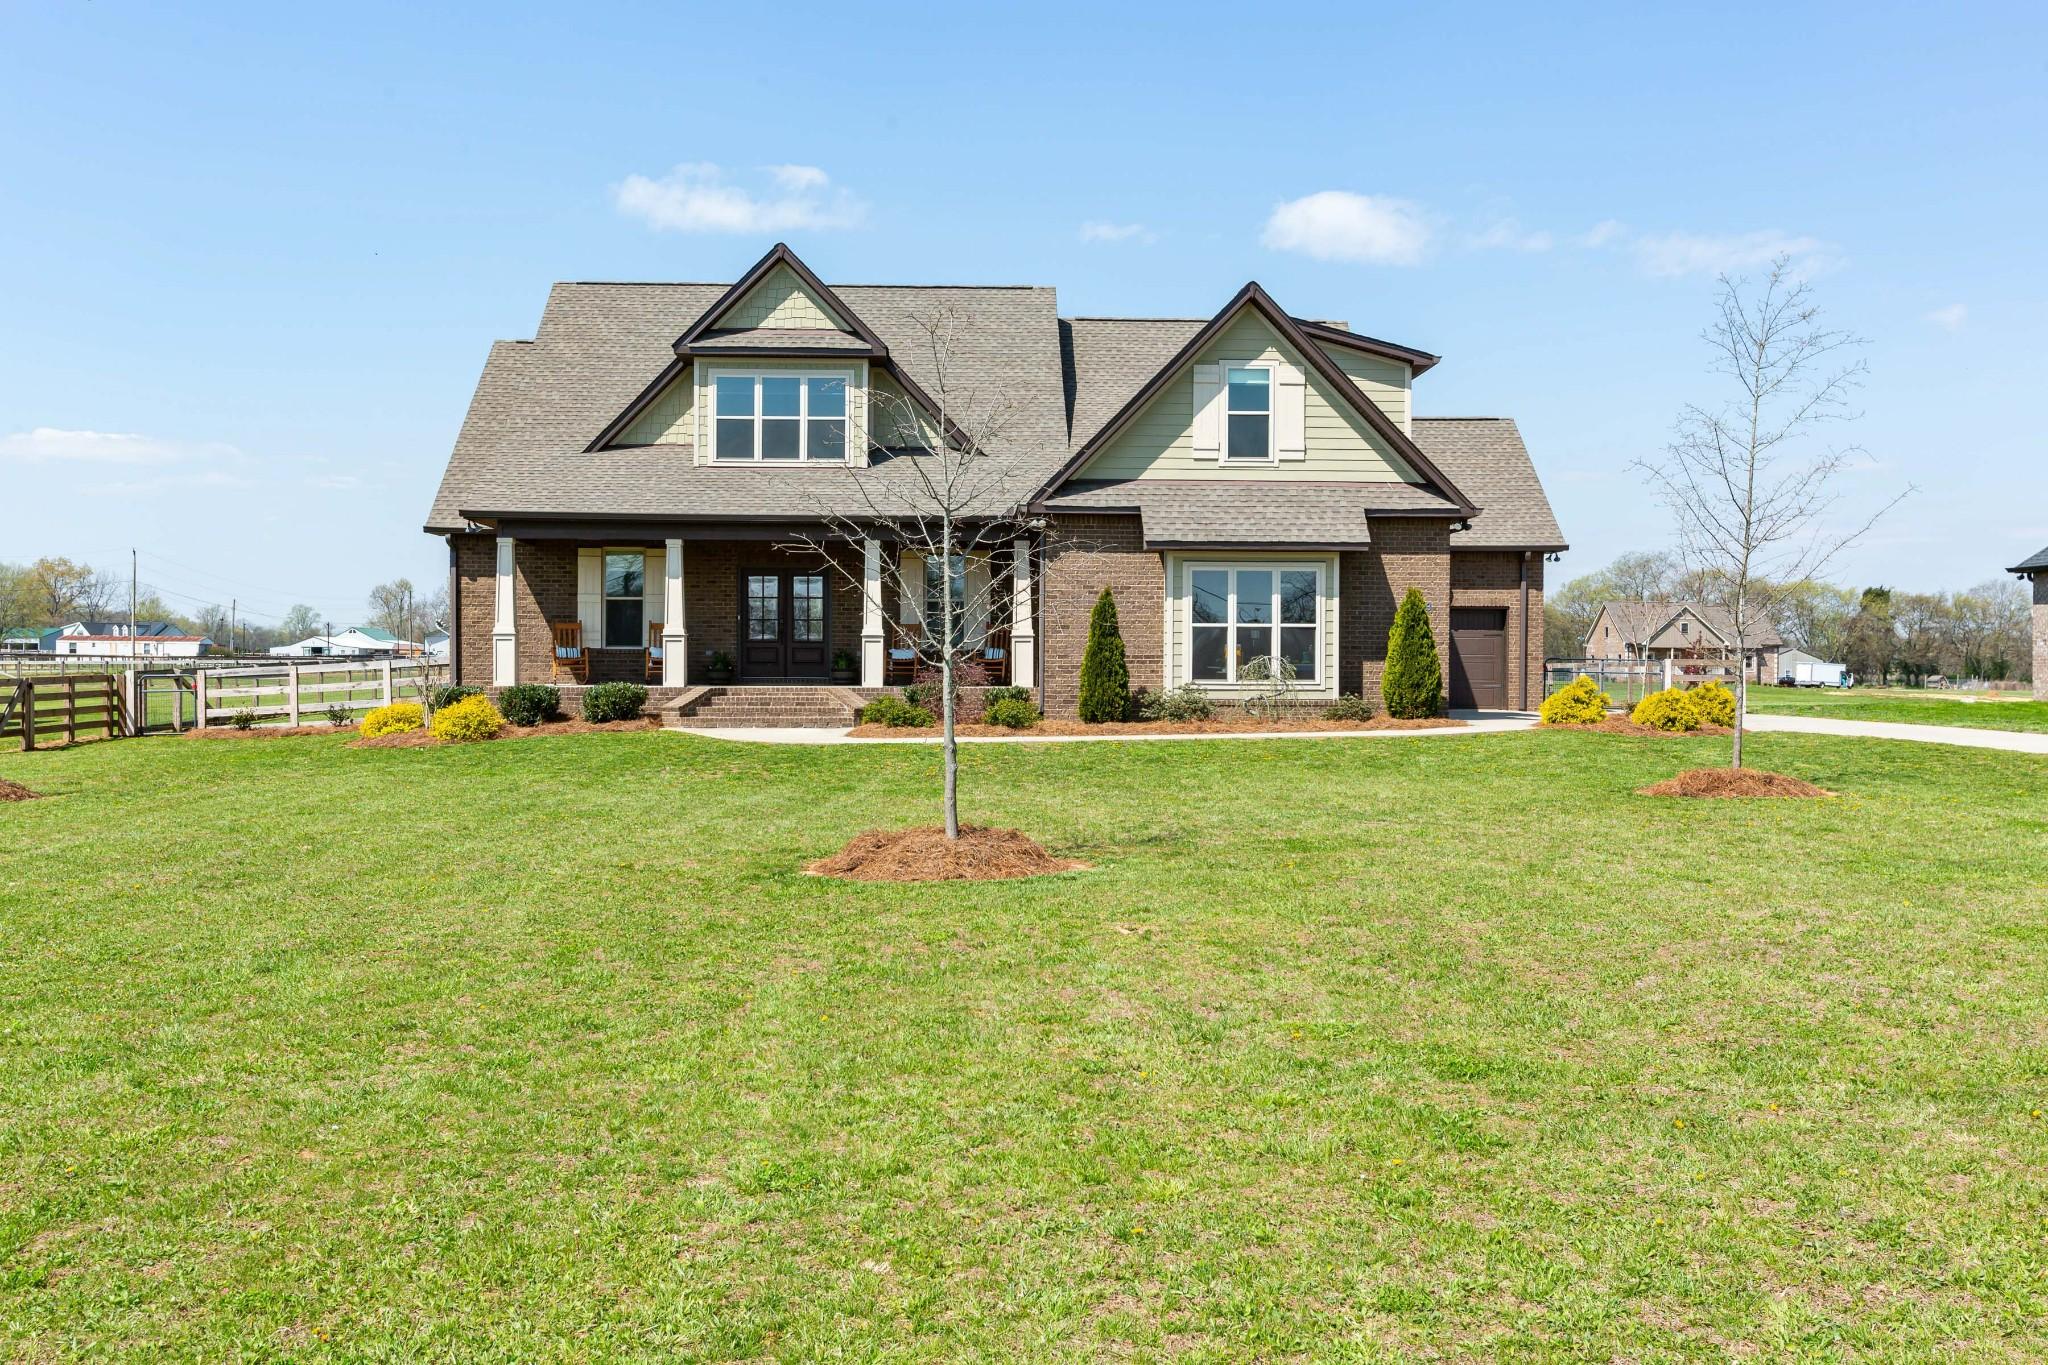 459 Halltown Rd Property Photo - Portland, TN real estate listing